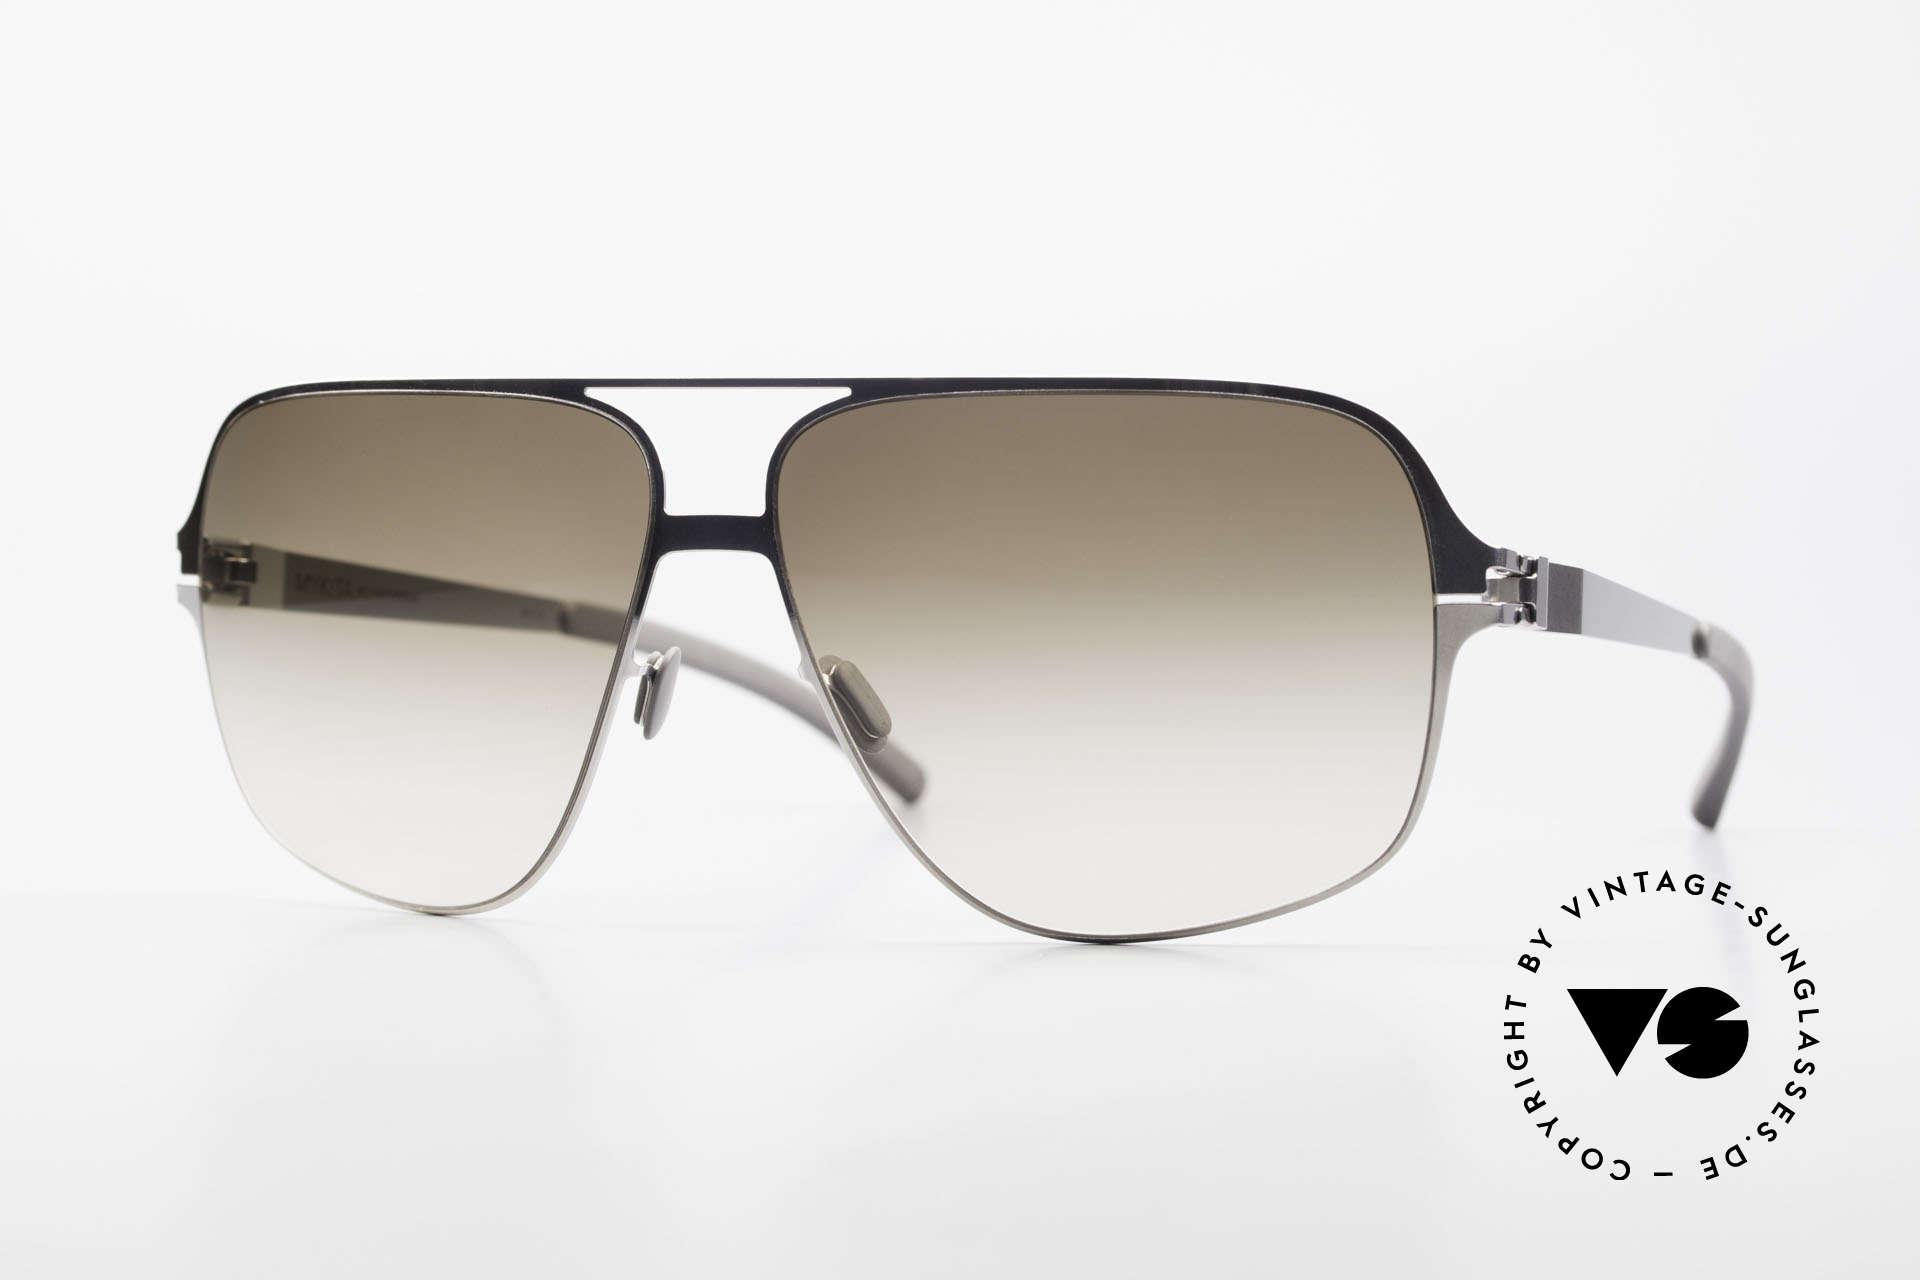 Mykita Cassius Lenny Kravitz Sunglasses XXL, Lenny Kravitz Mykita sunglasses from 2010, VINTAGE, Made for Men